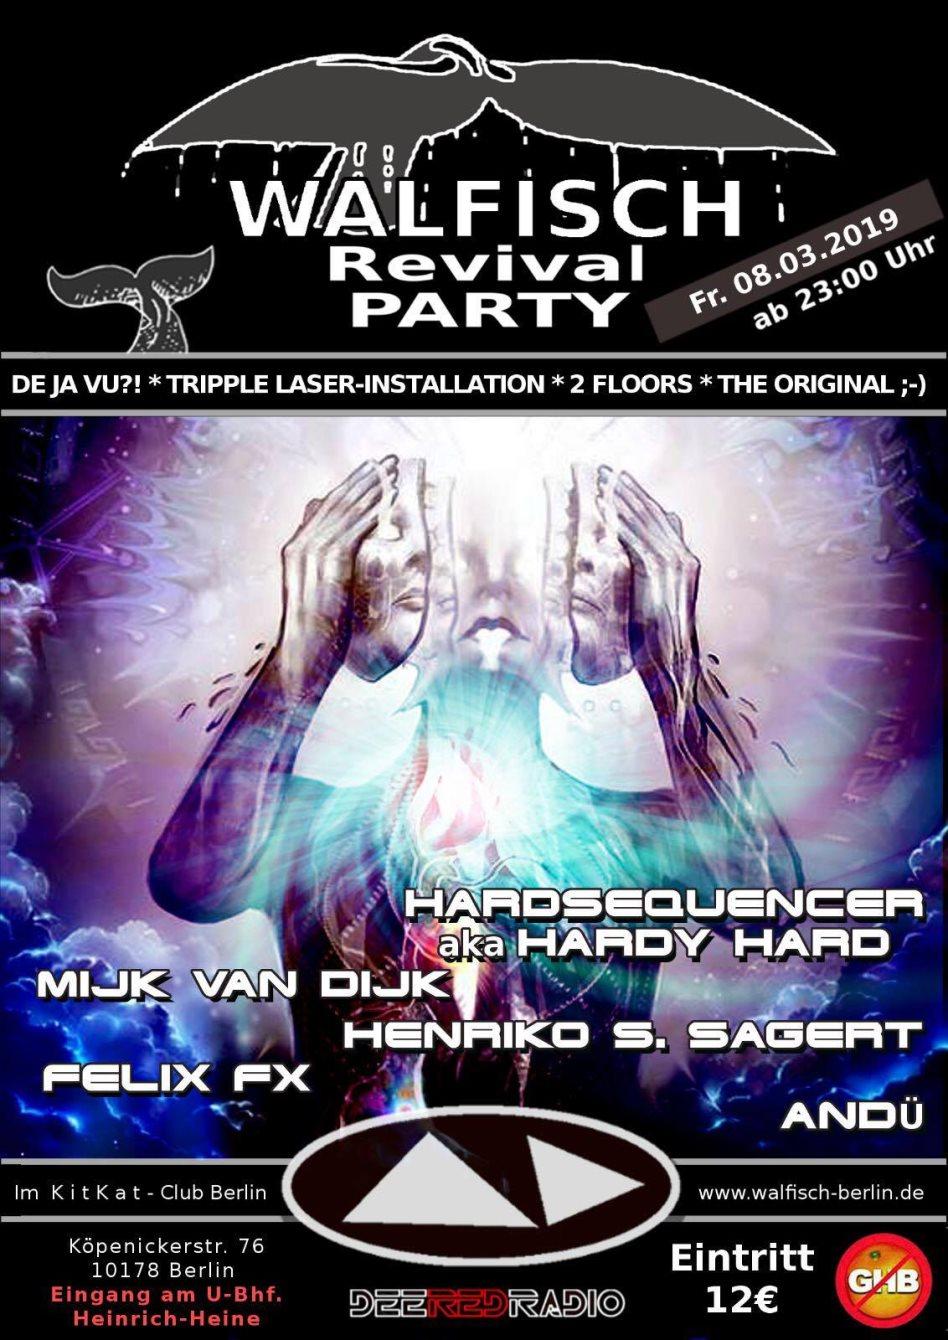 Ra Walfisch Revival Party At Kitkatclub Berlin